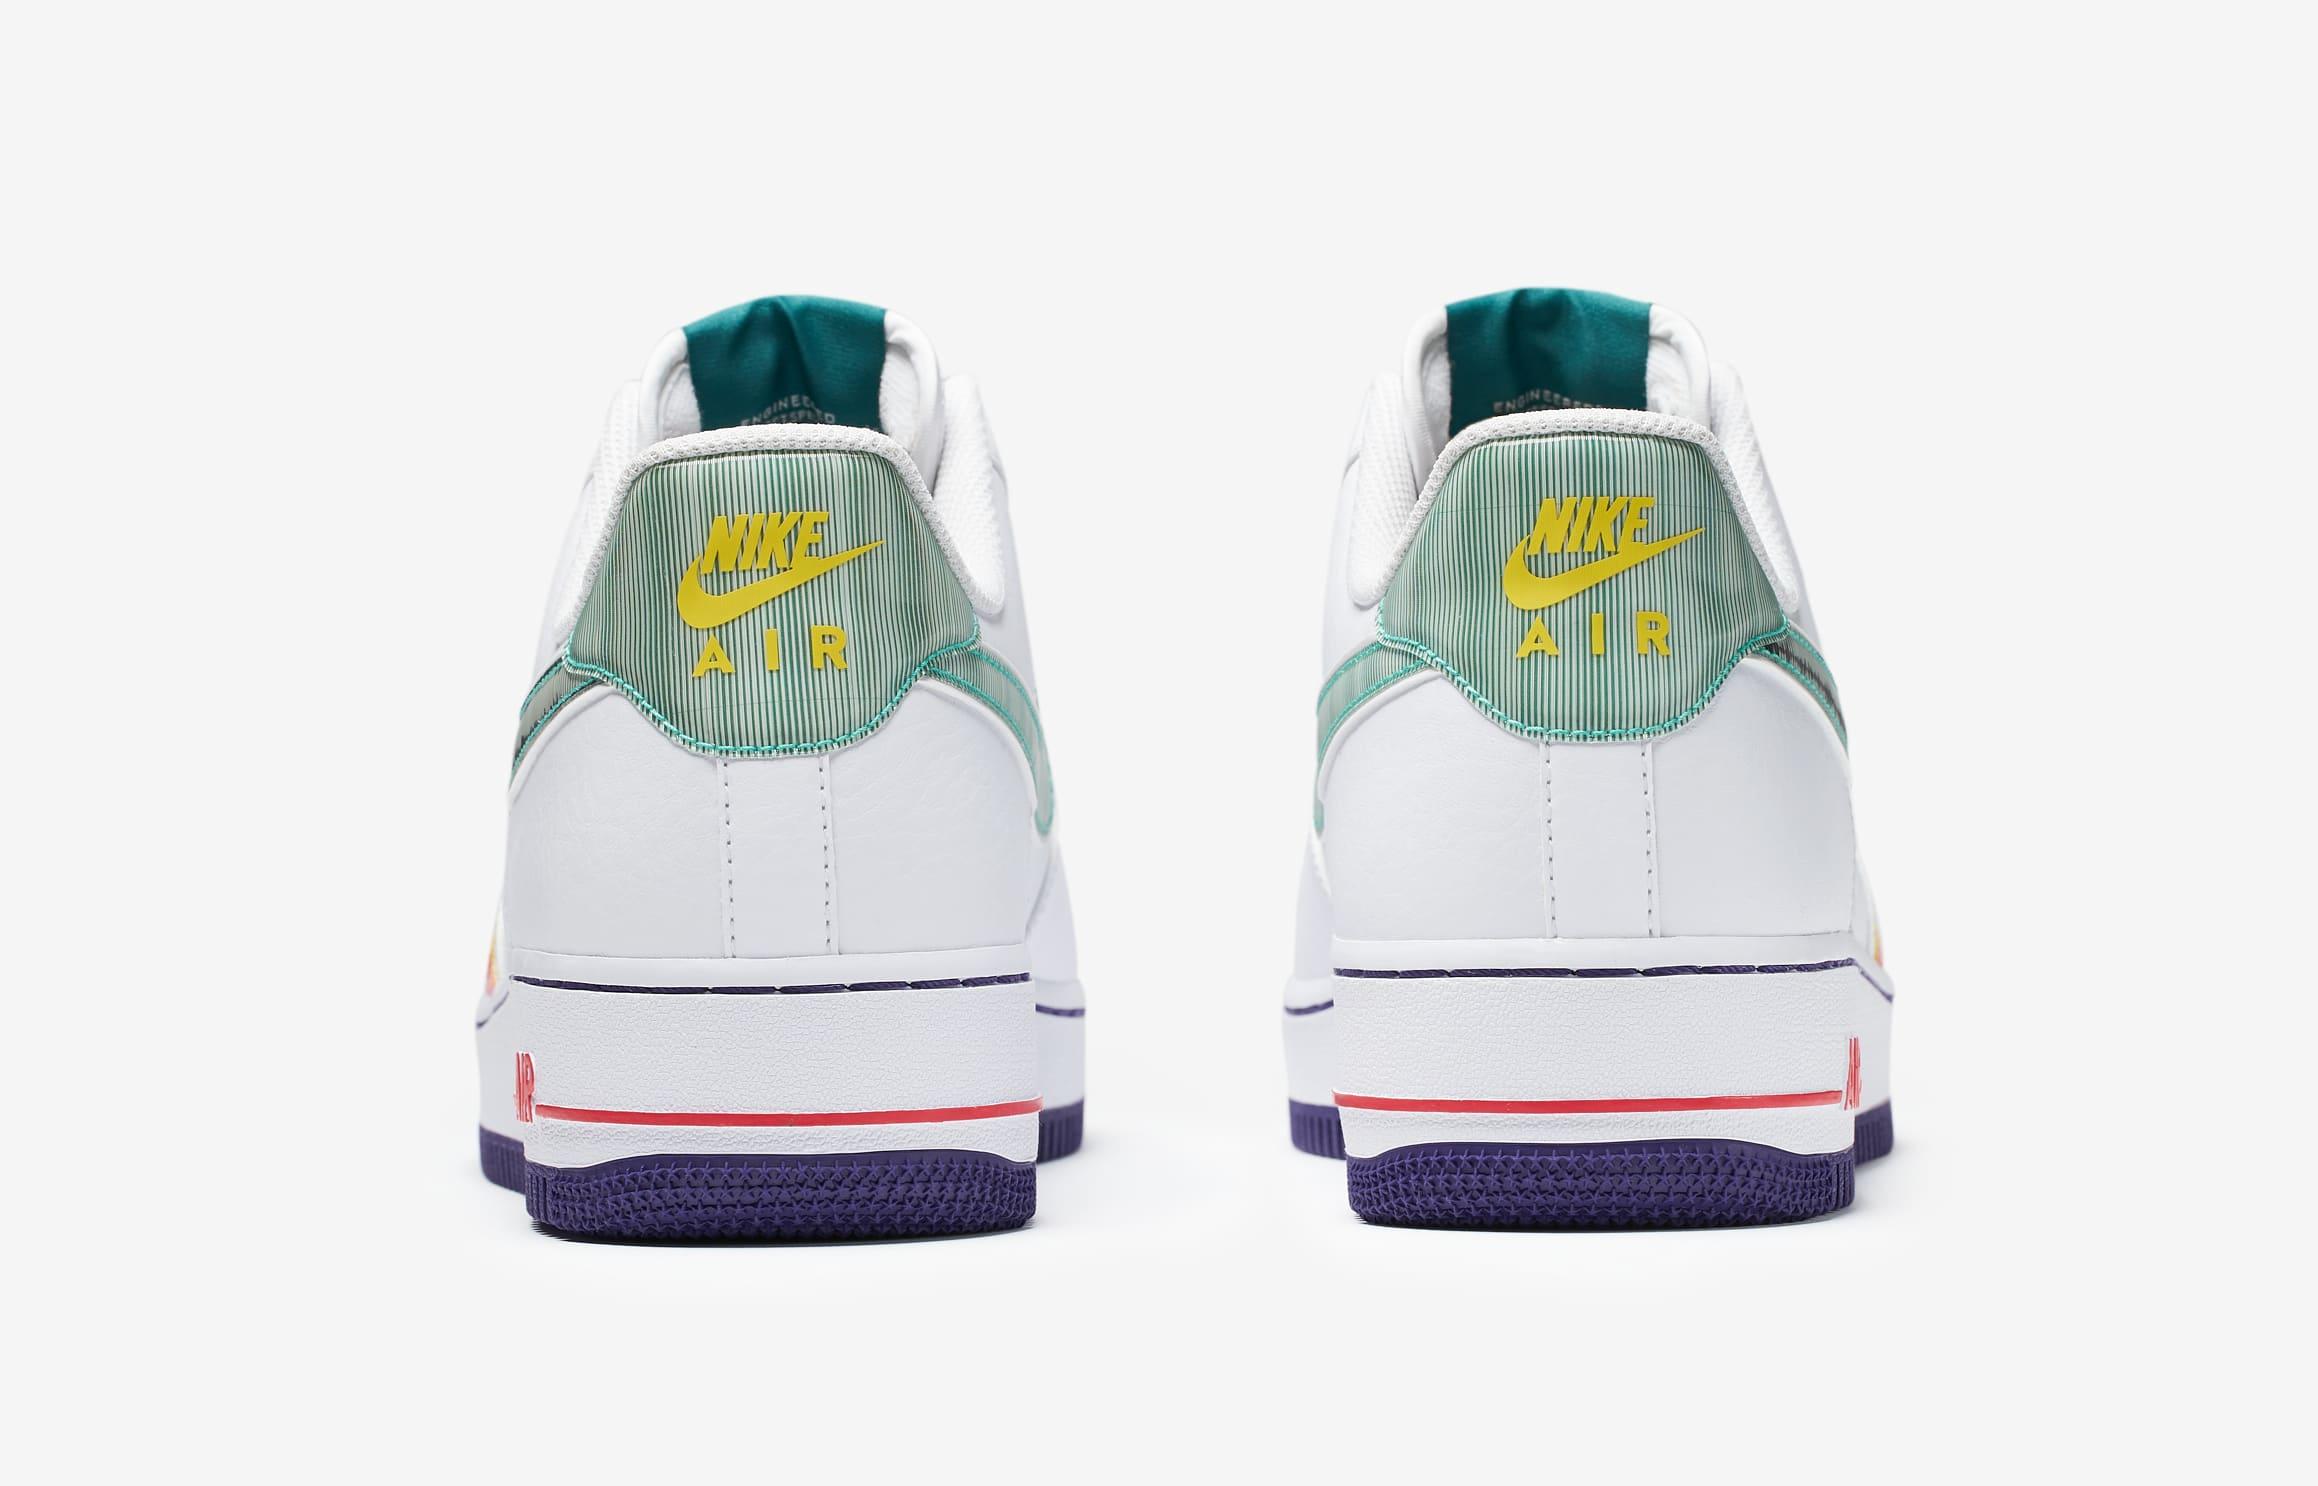 Nike Air Force 1 Low 'Pregame' Heel